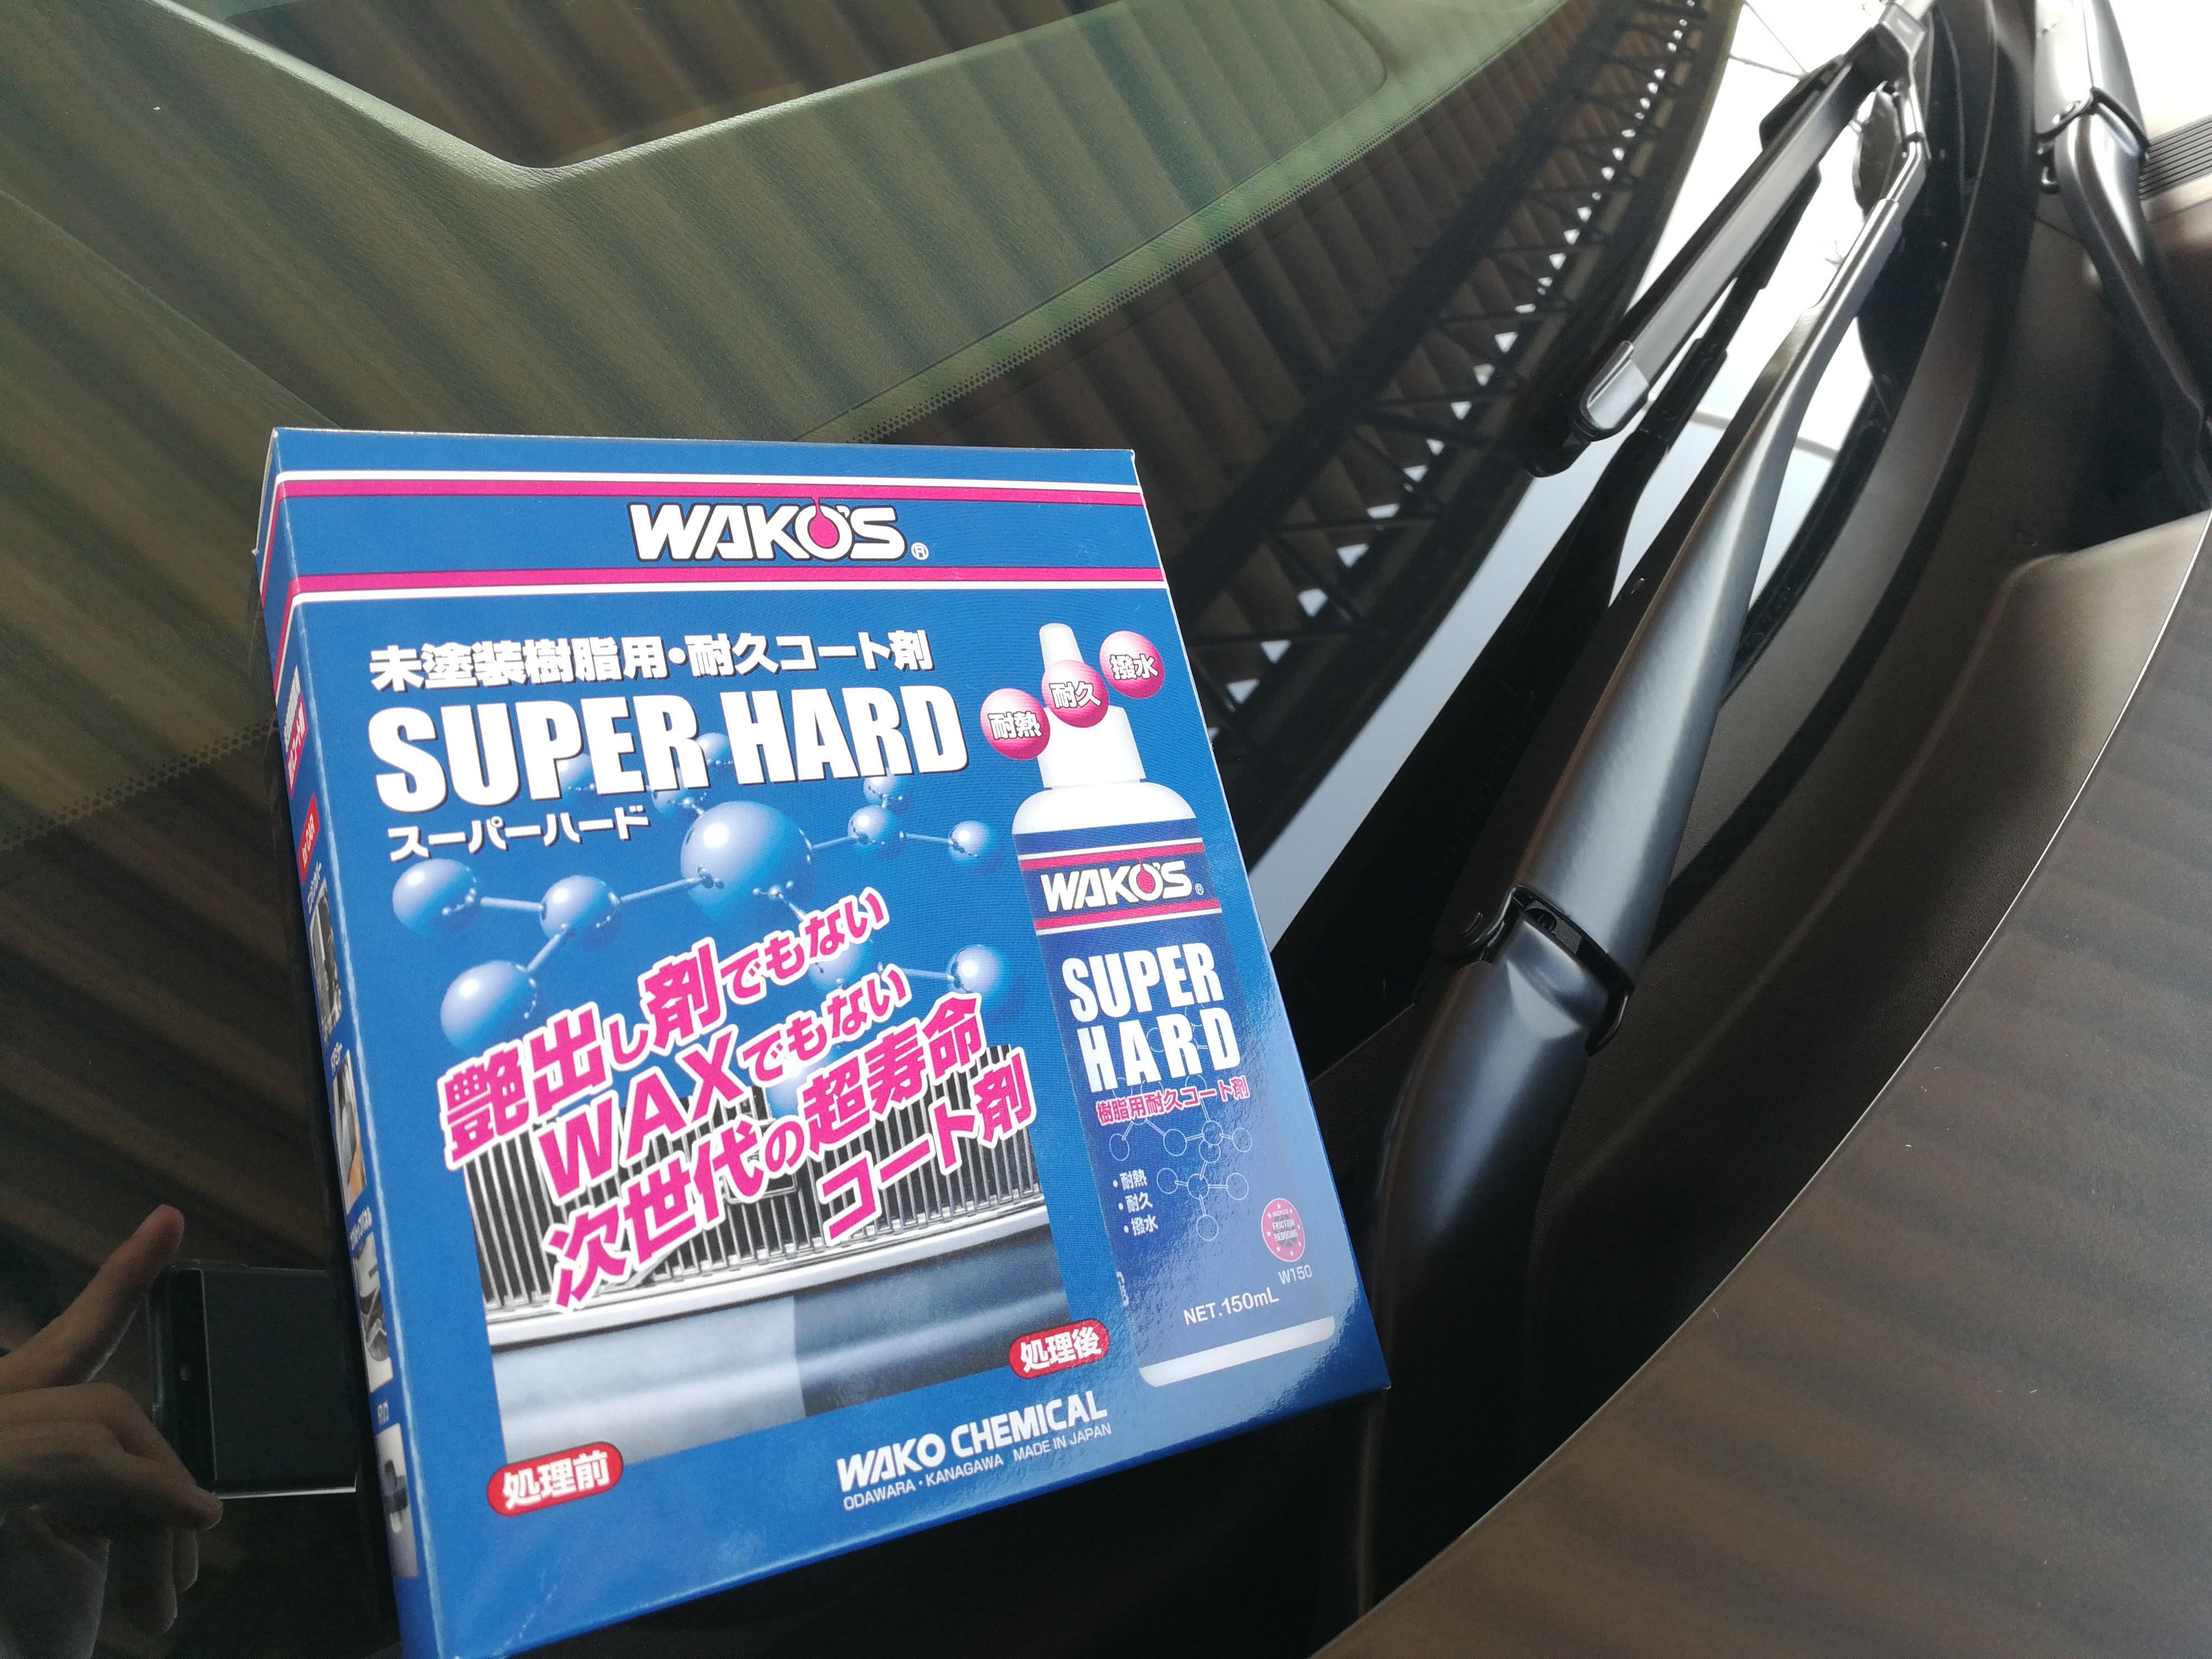 CX-5納車から6ヶ月「WAKO'S スーパーハード」を施工して樹脂パーツの白化を確認